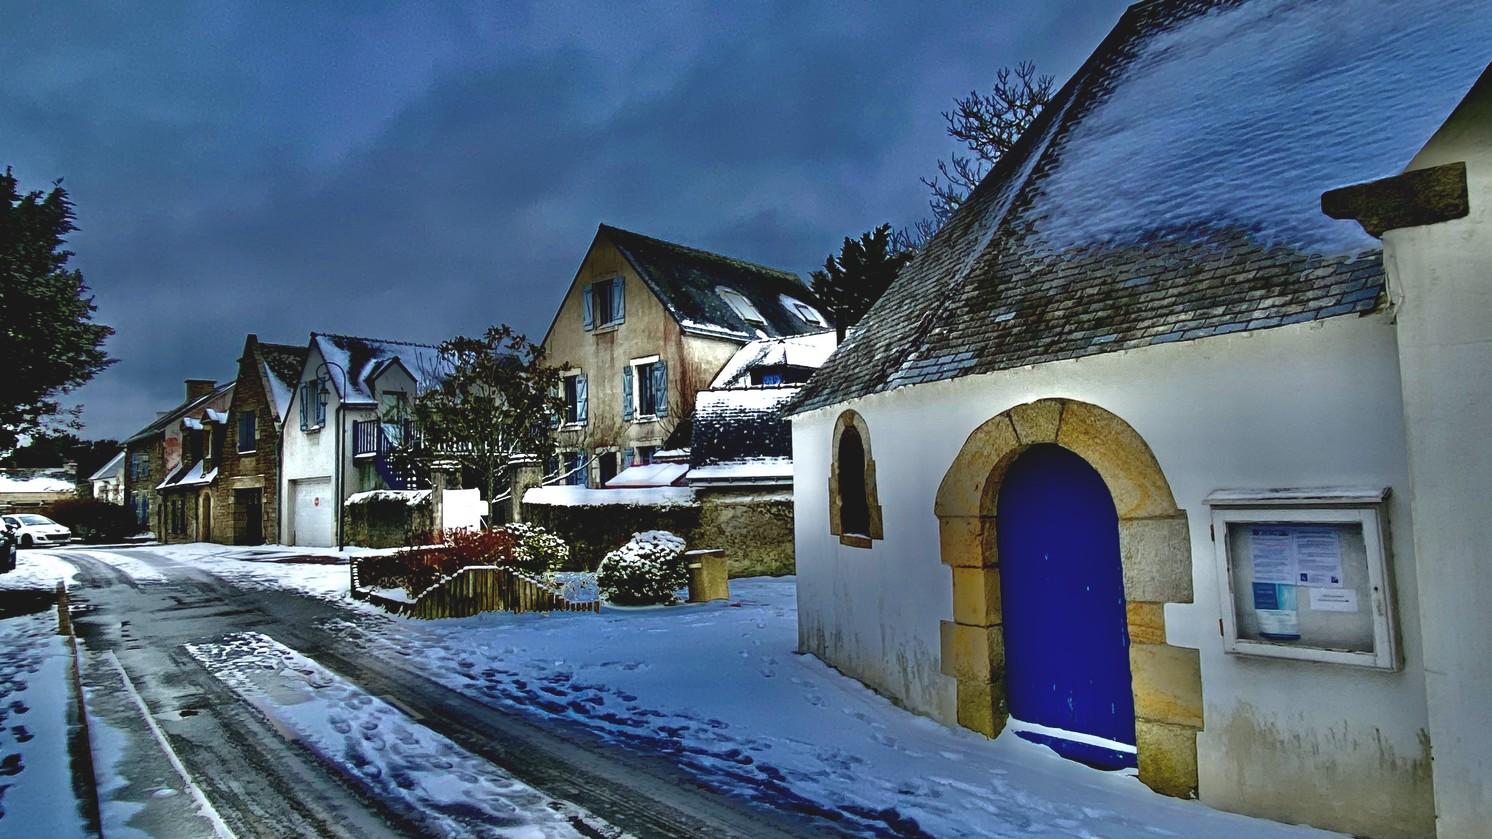 Penerf en Damgan sous la neige - morbihan bretagne©Philippe Jaquemin (26)